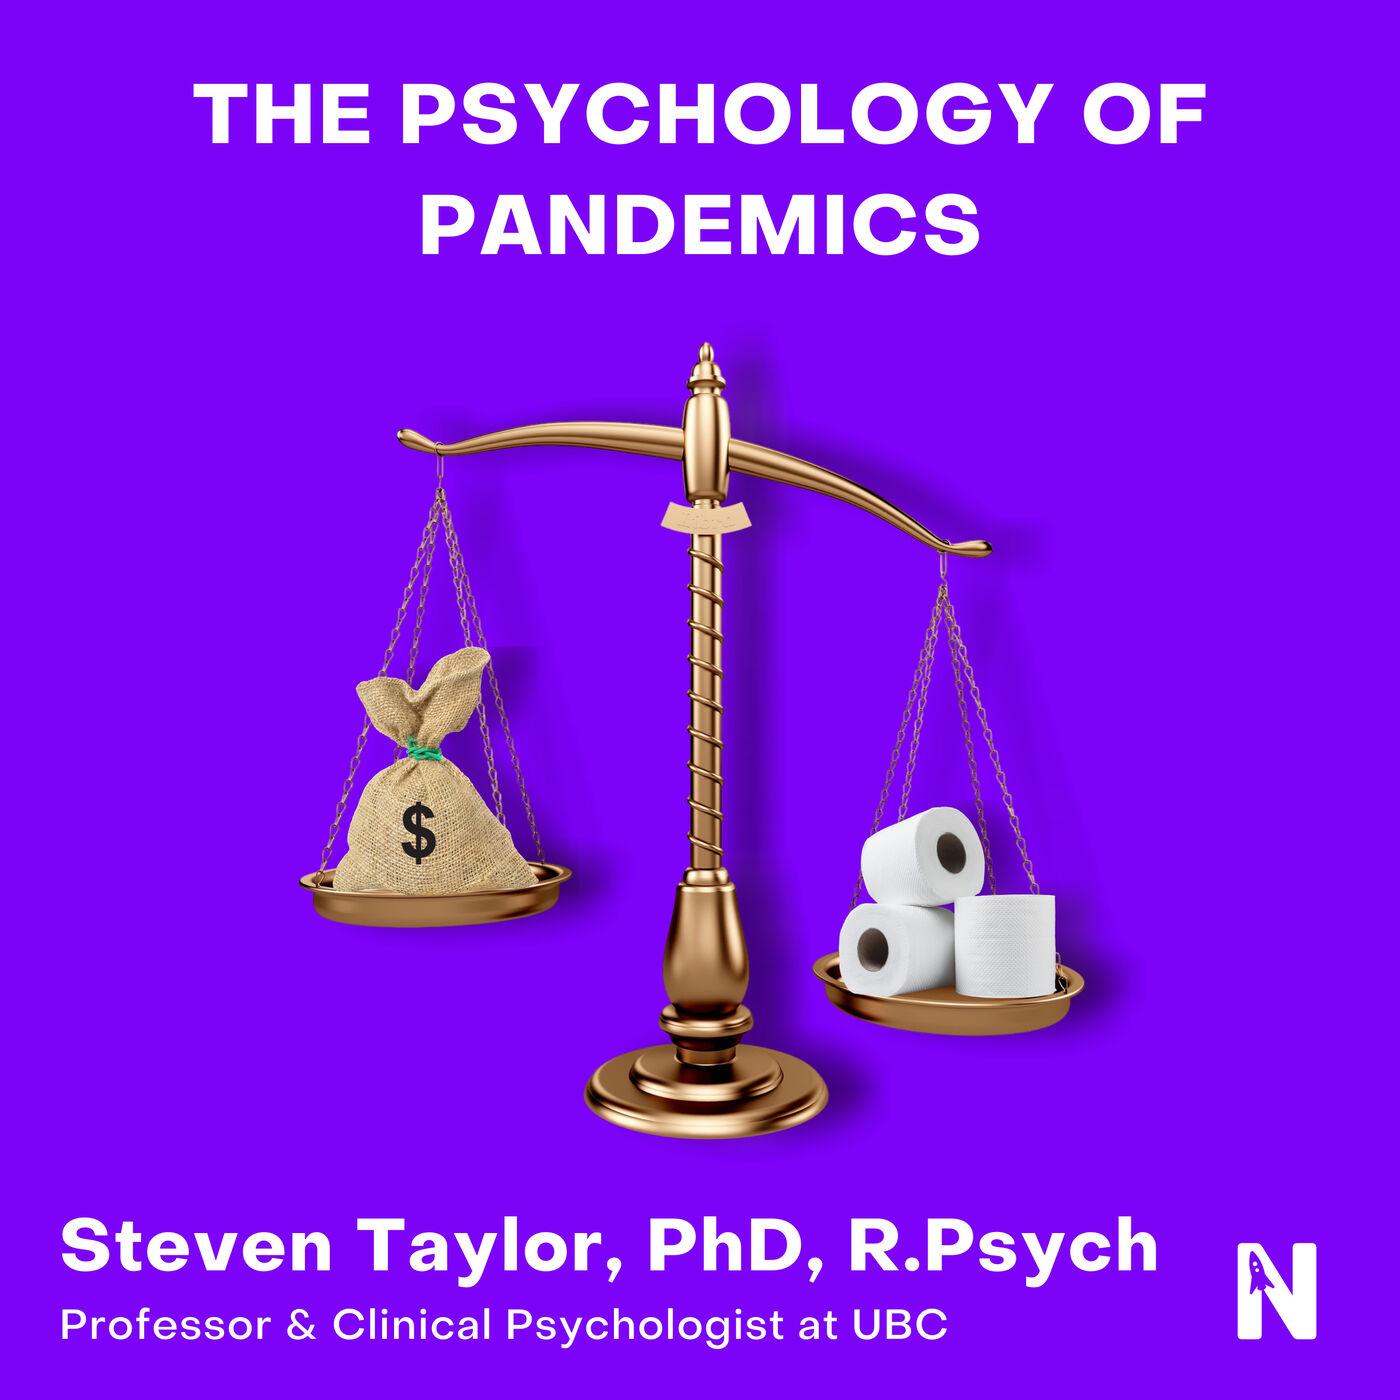 The Psychology of Pandemics   Steven Taylor